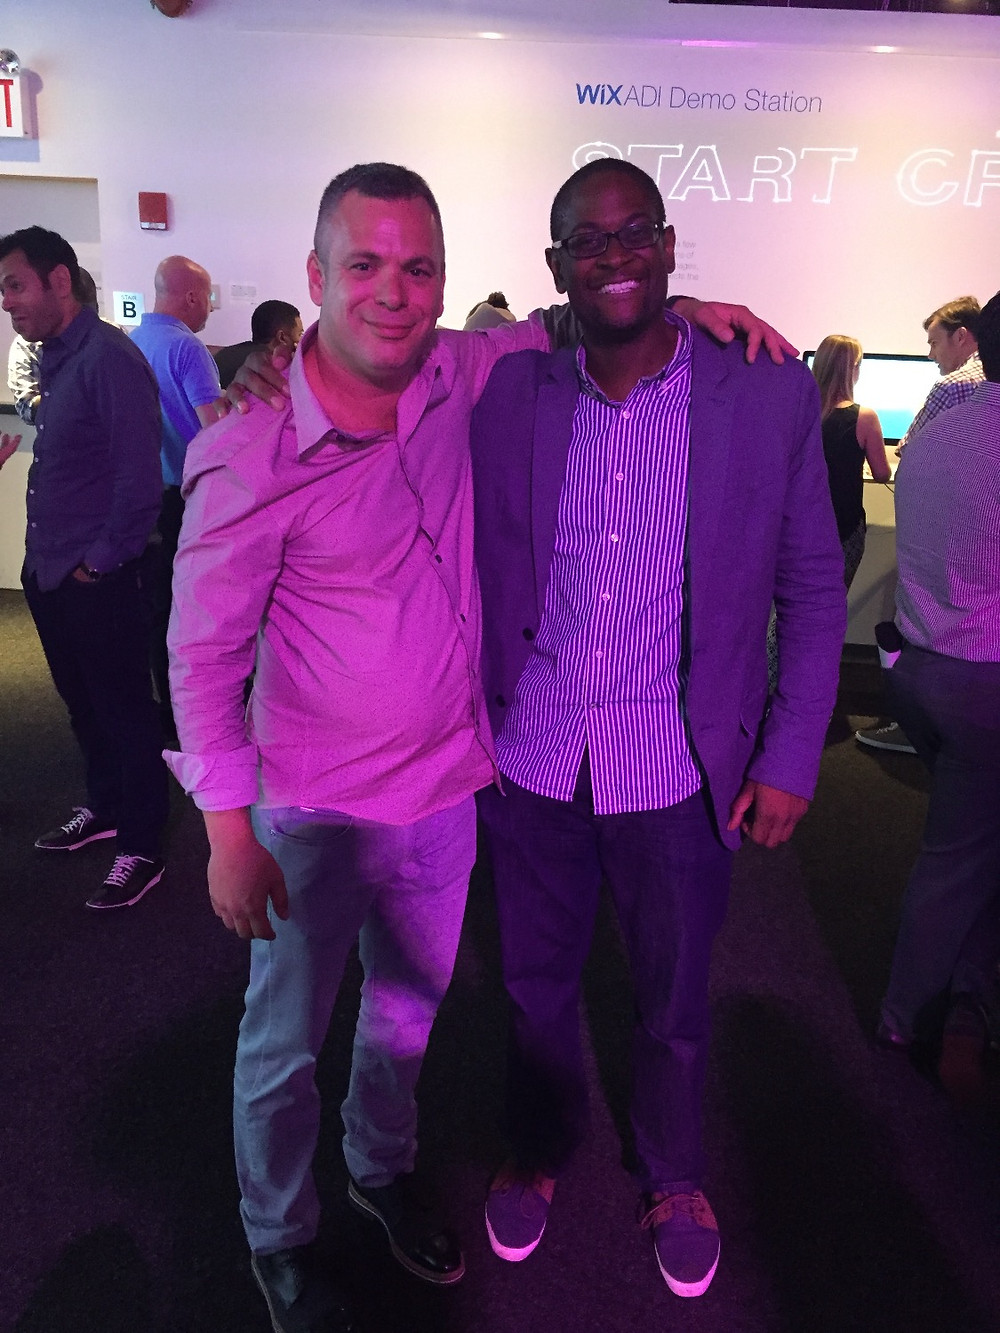 Voux Co-Founder, Freddie Roseman, takes a snapshot with Wix CEO Avishai Abrahami. Cool!